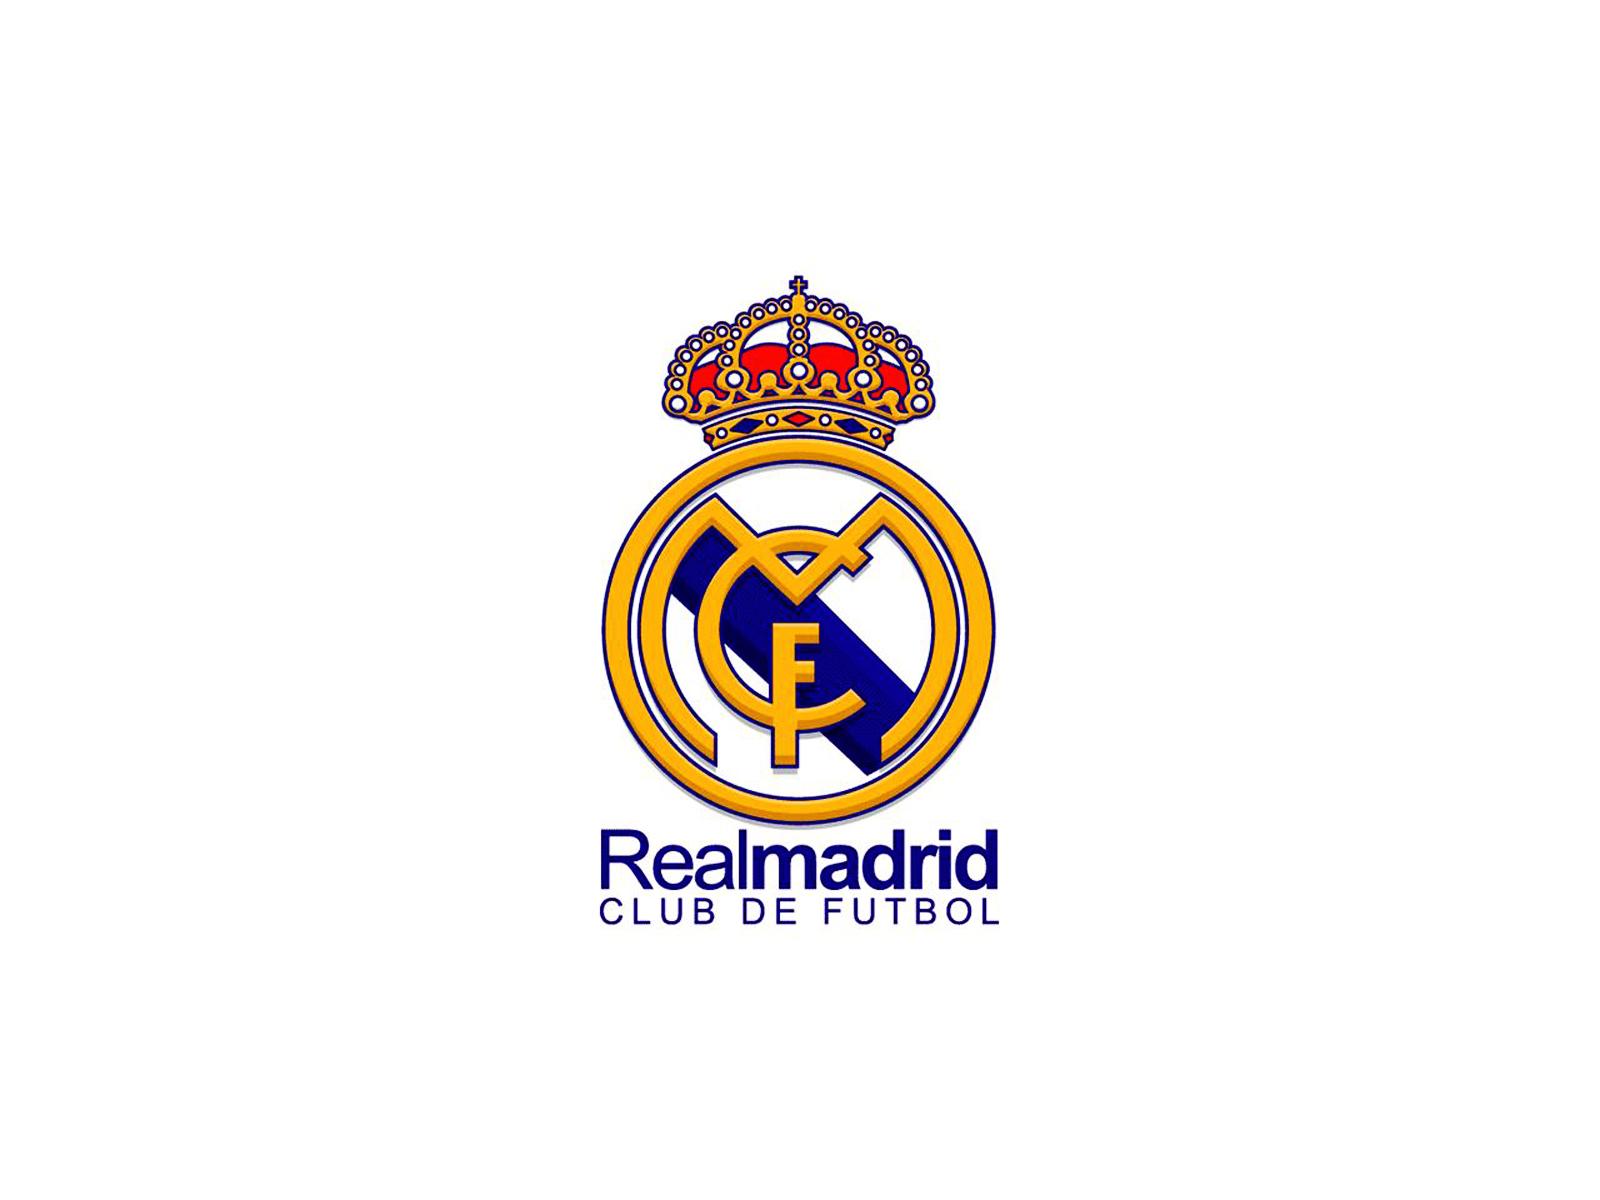 photos of real madrid logo